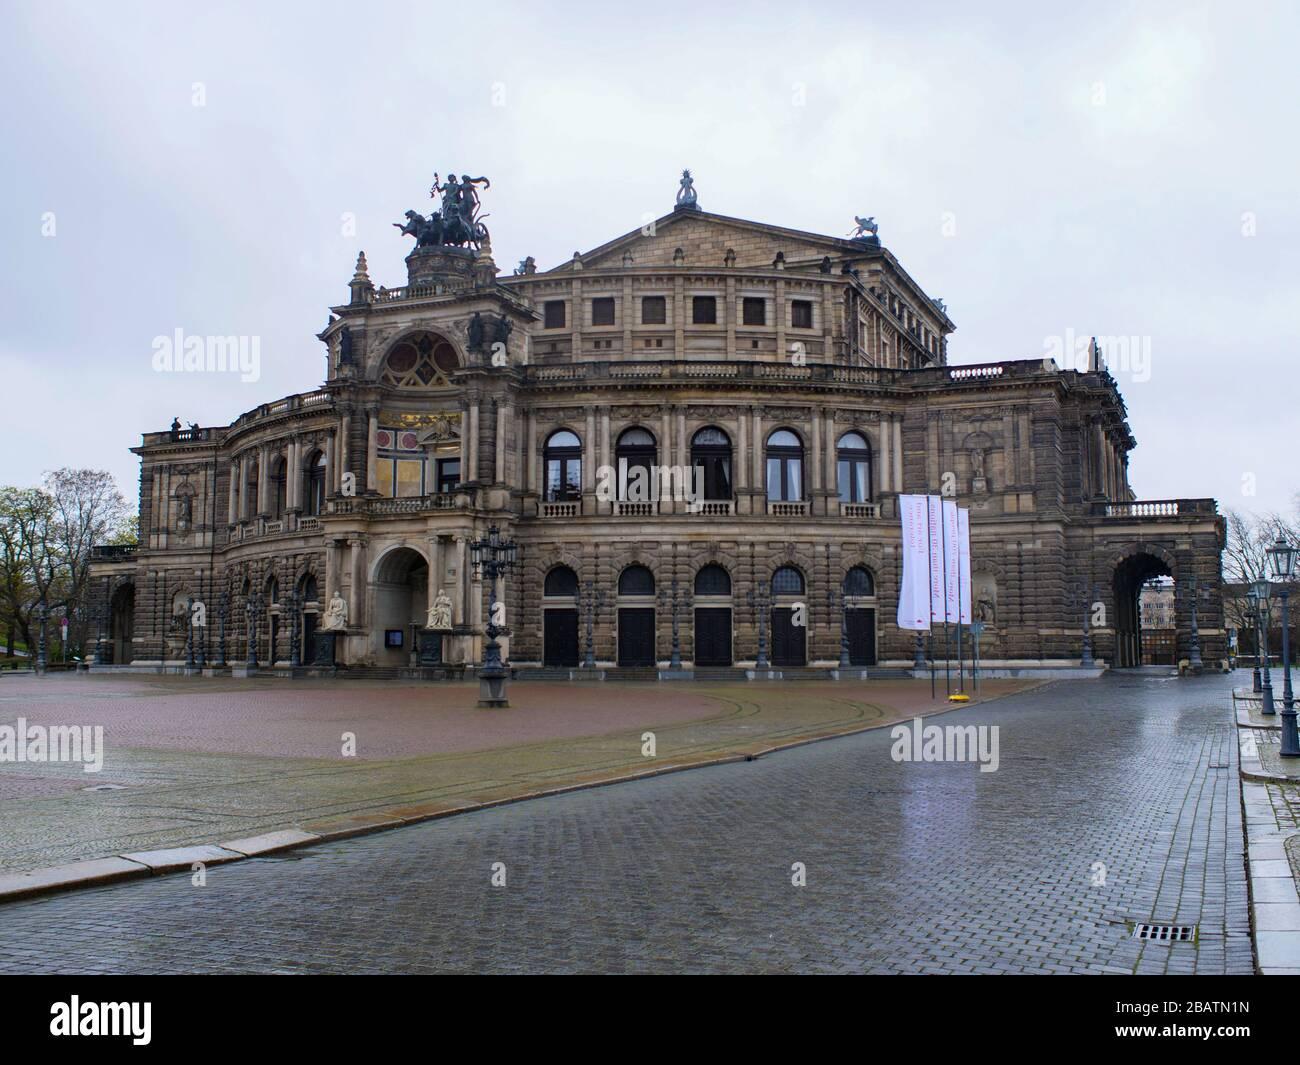 Semperoper Dresden während Coronavirus Lockdown im Regenwetter Opernhaus Oper Stock Photo